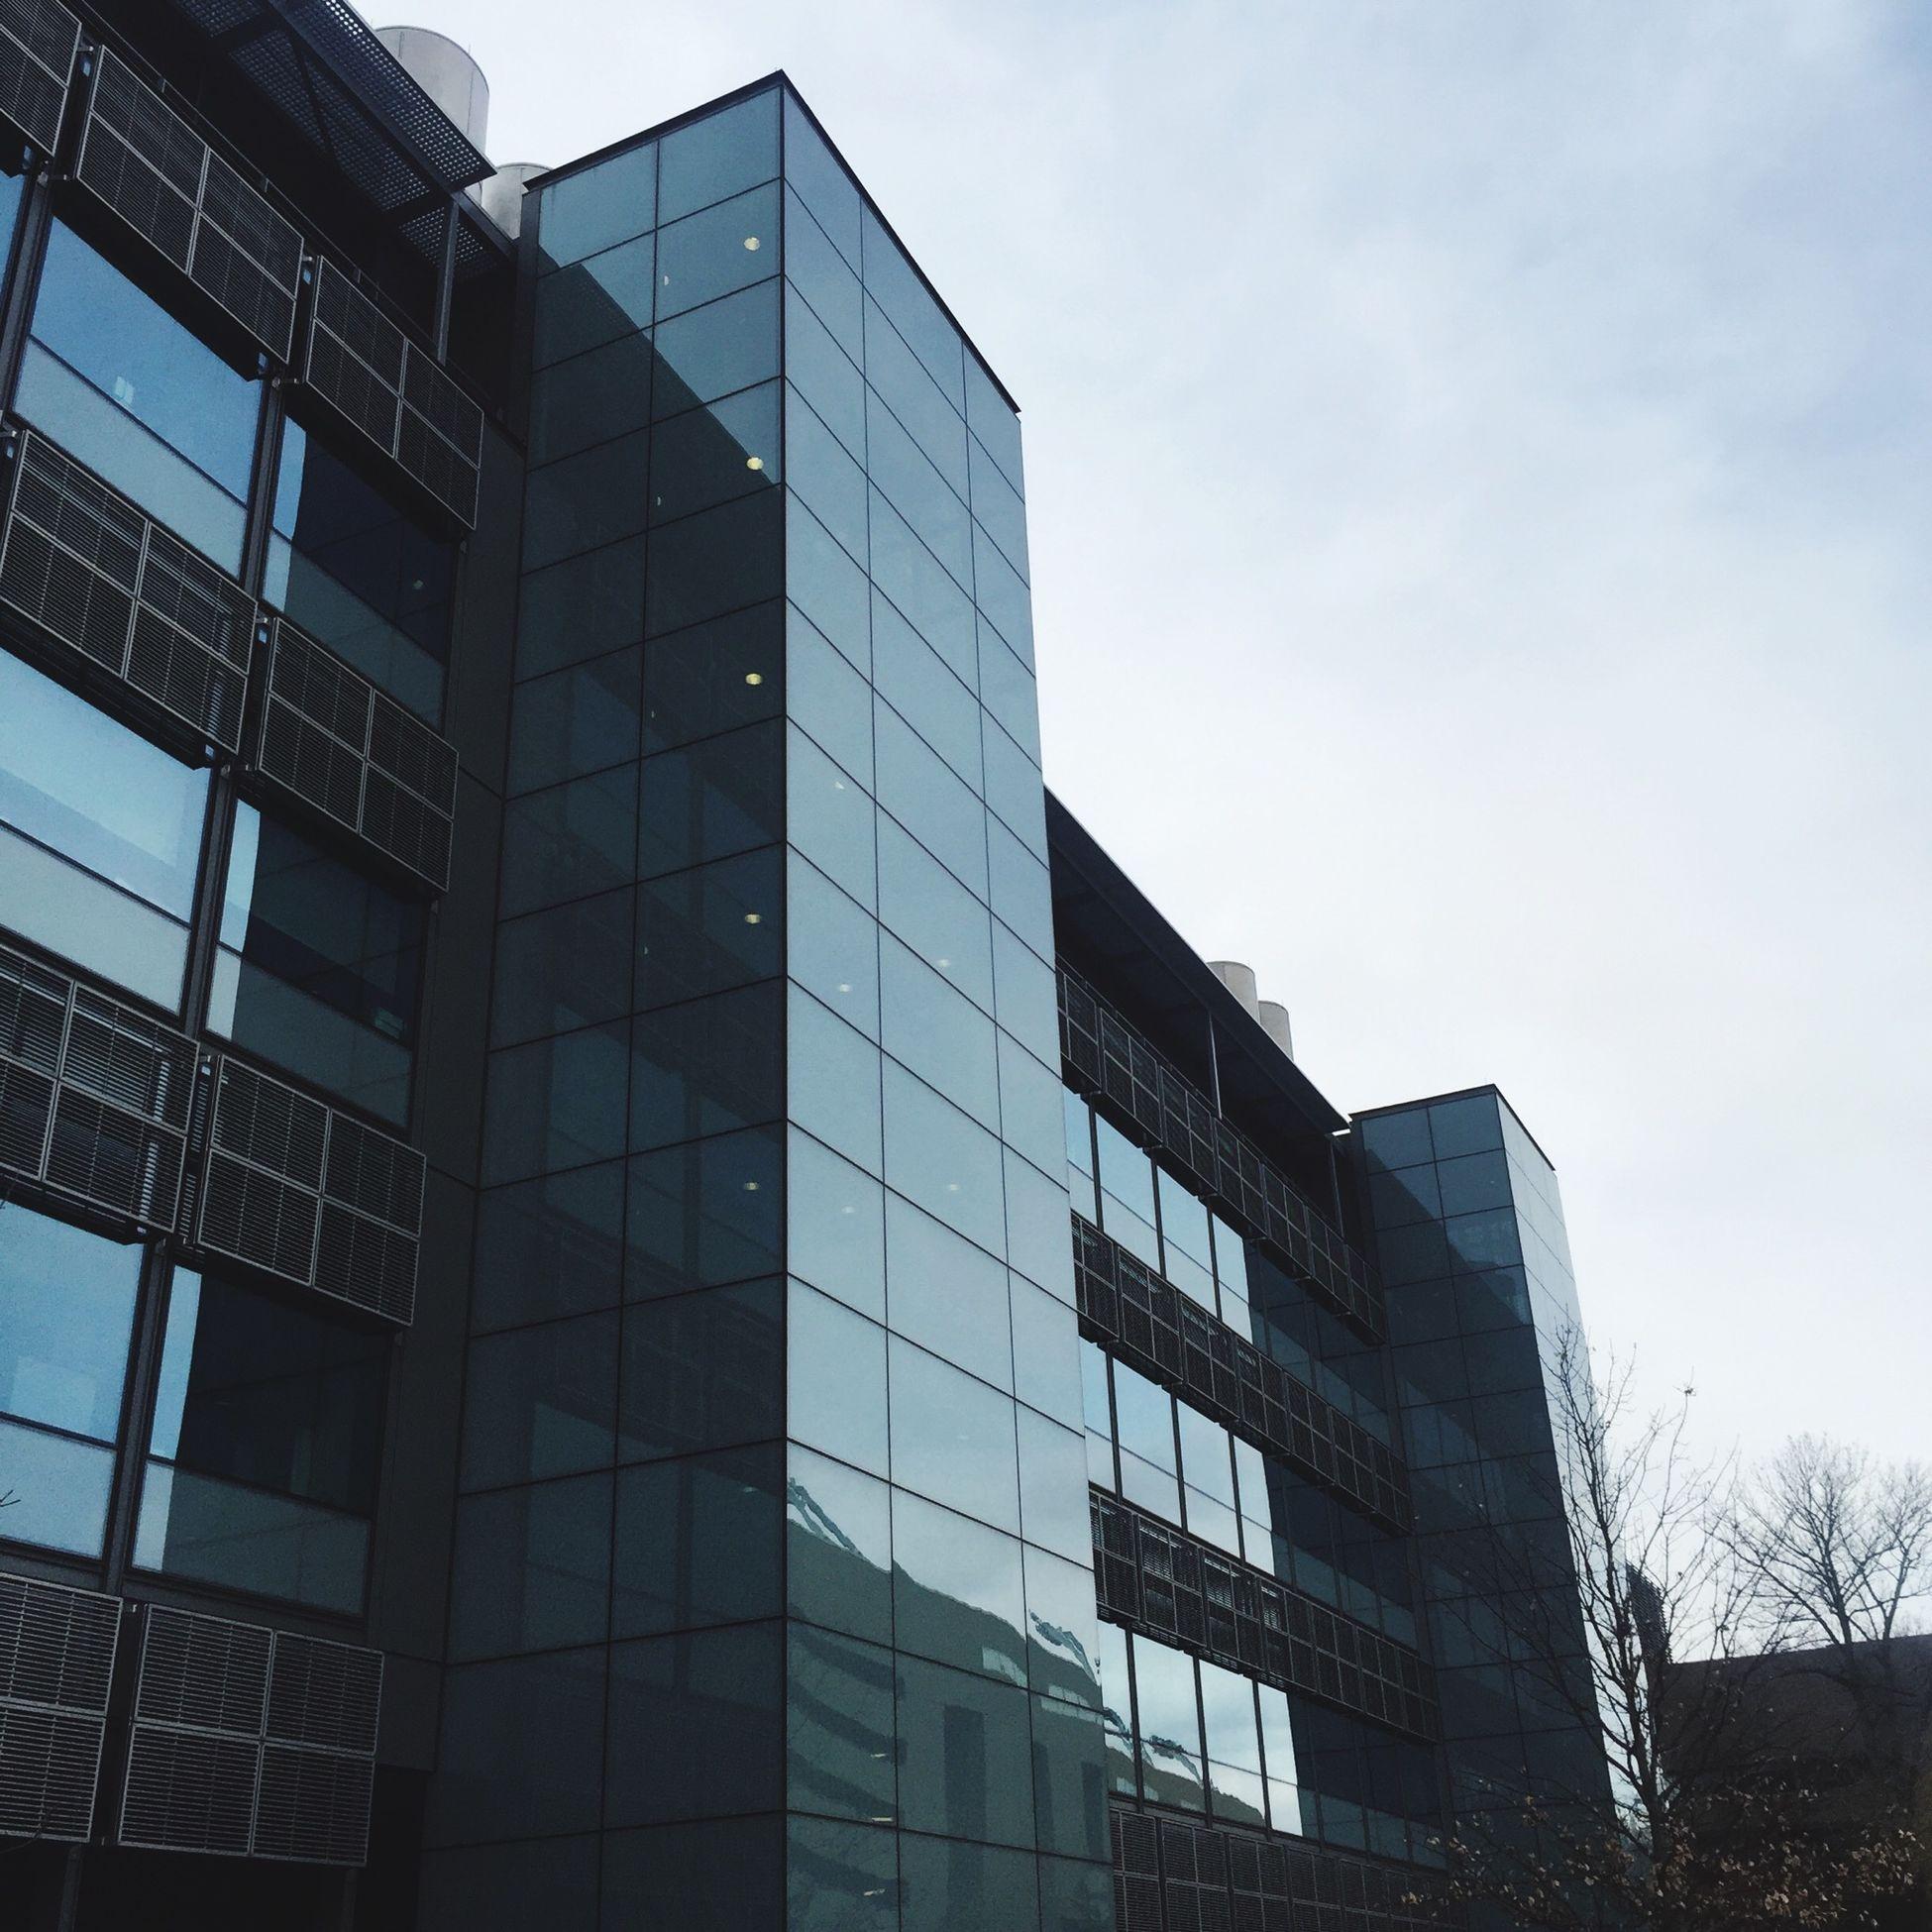 Princeton USA Architecture Glass Nynj Nj